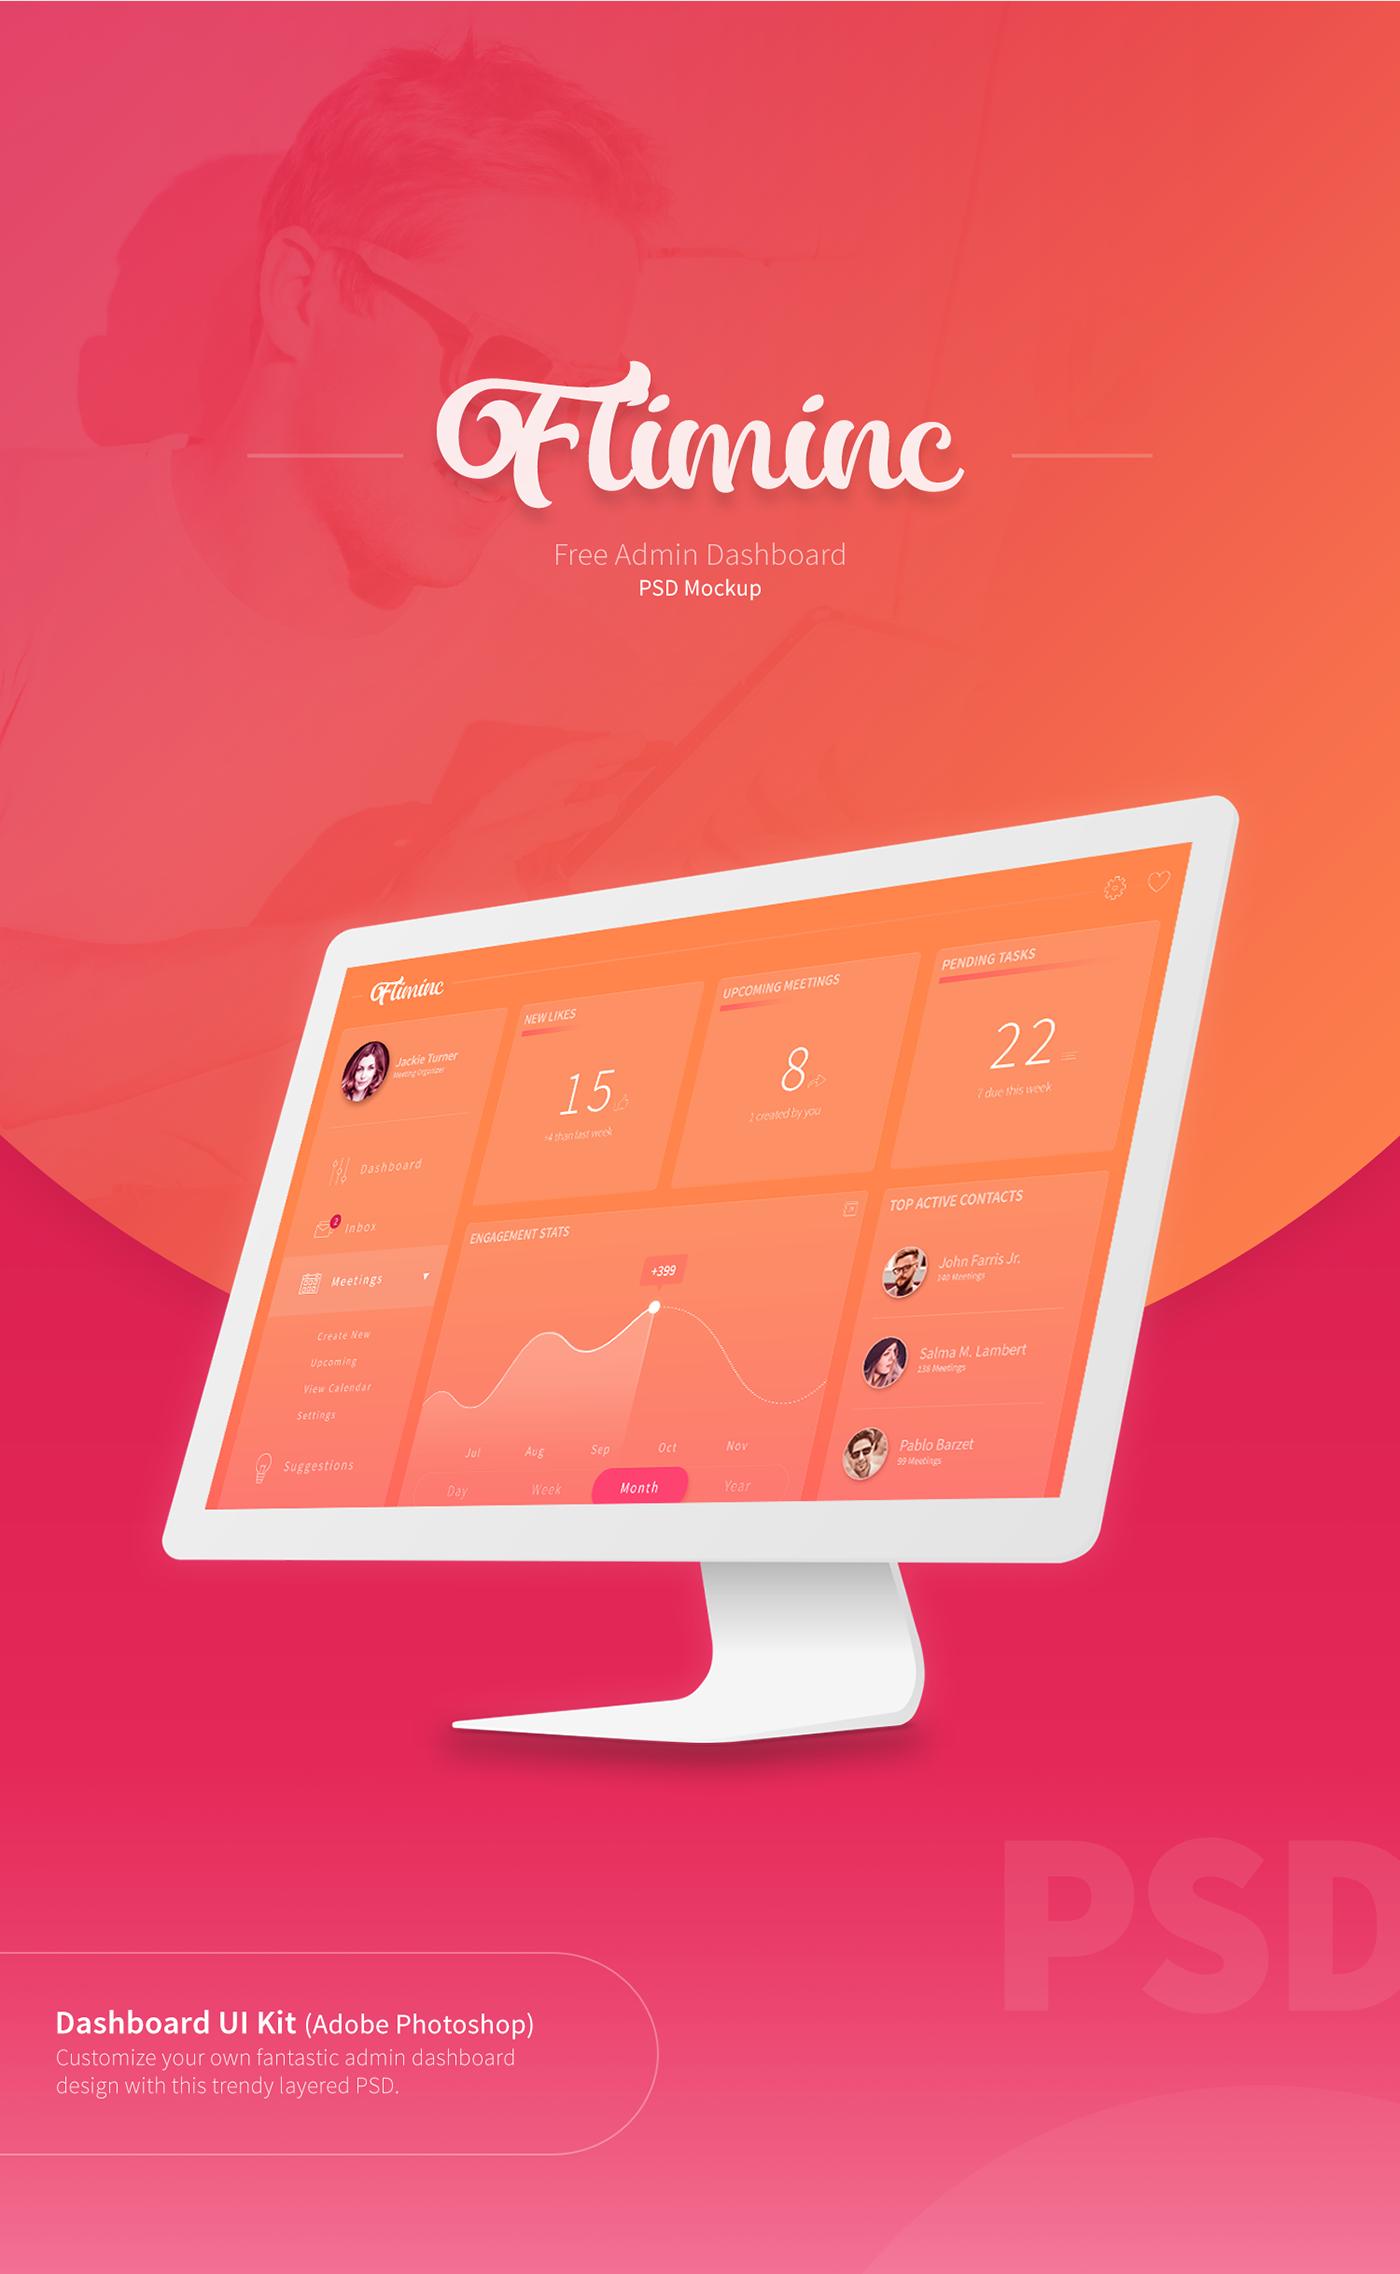 admin psd template,Admin Panel Mockup,admin dashboard psd,Admin dashboard,dashboard ui,free dashboard template,Admin Dashboard UI,free dashboard,free psd,Free Template